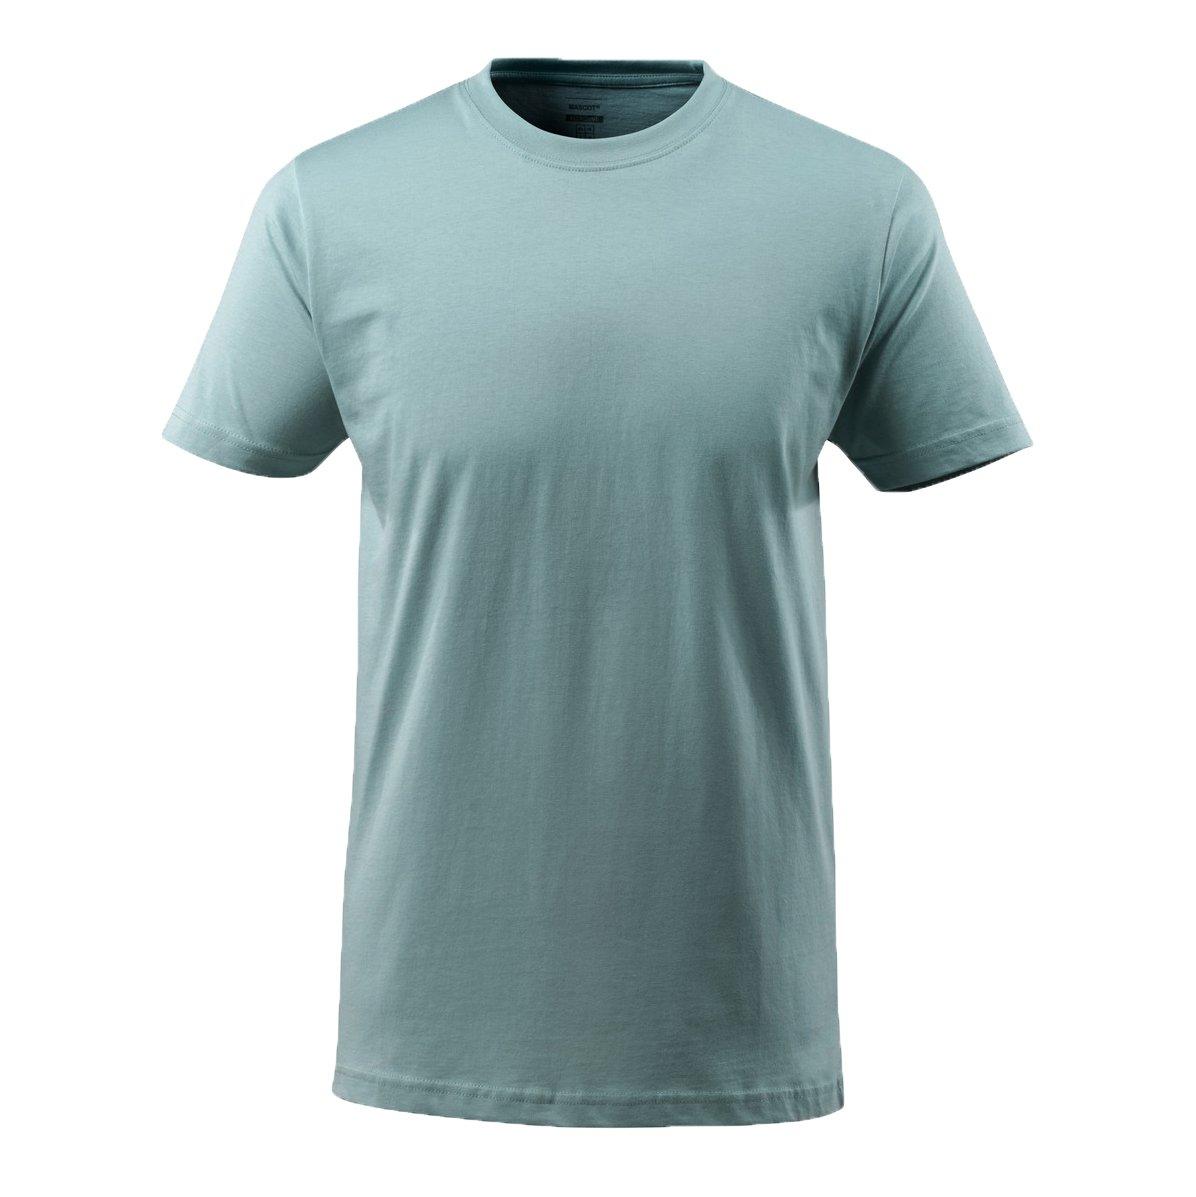 Mascot 51579-965-94-2XL T-ShirtCalais Size 2XL Pastel Blue